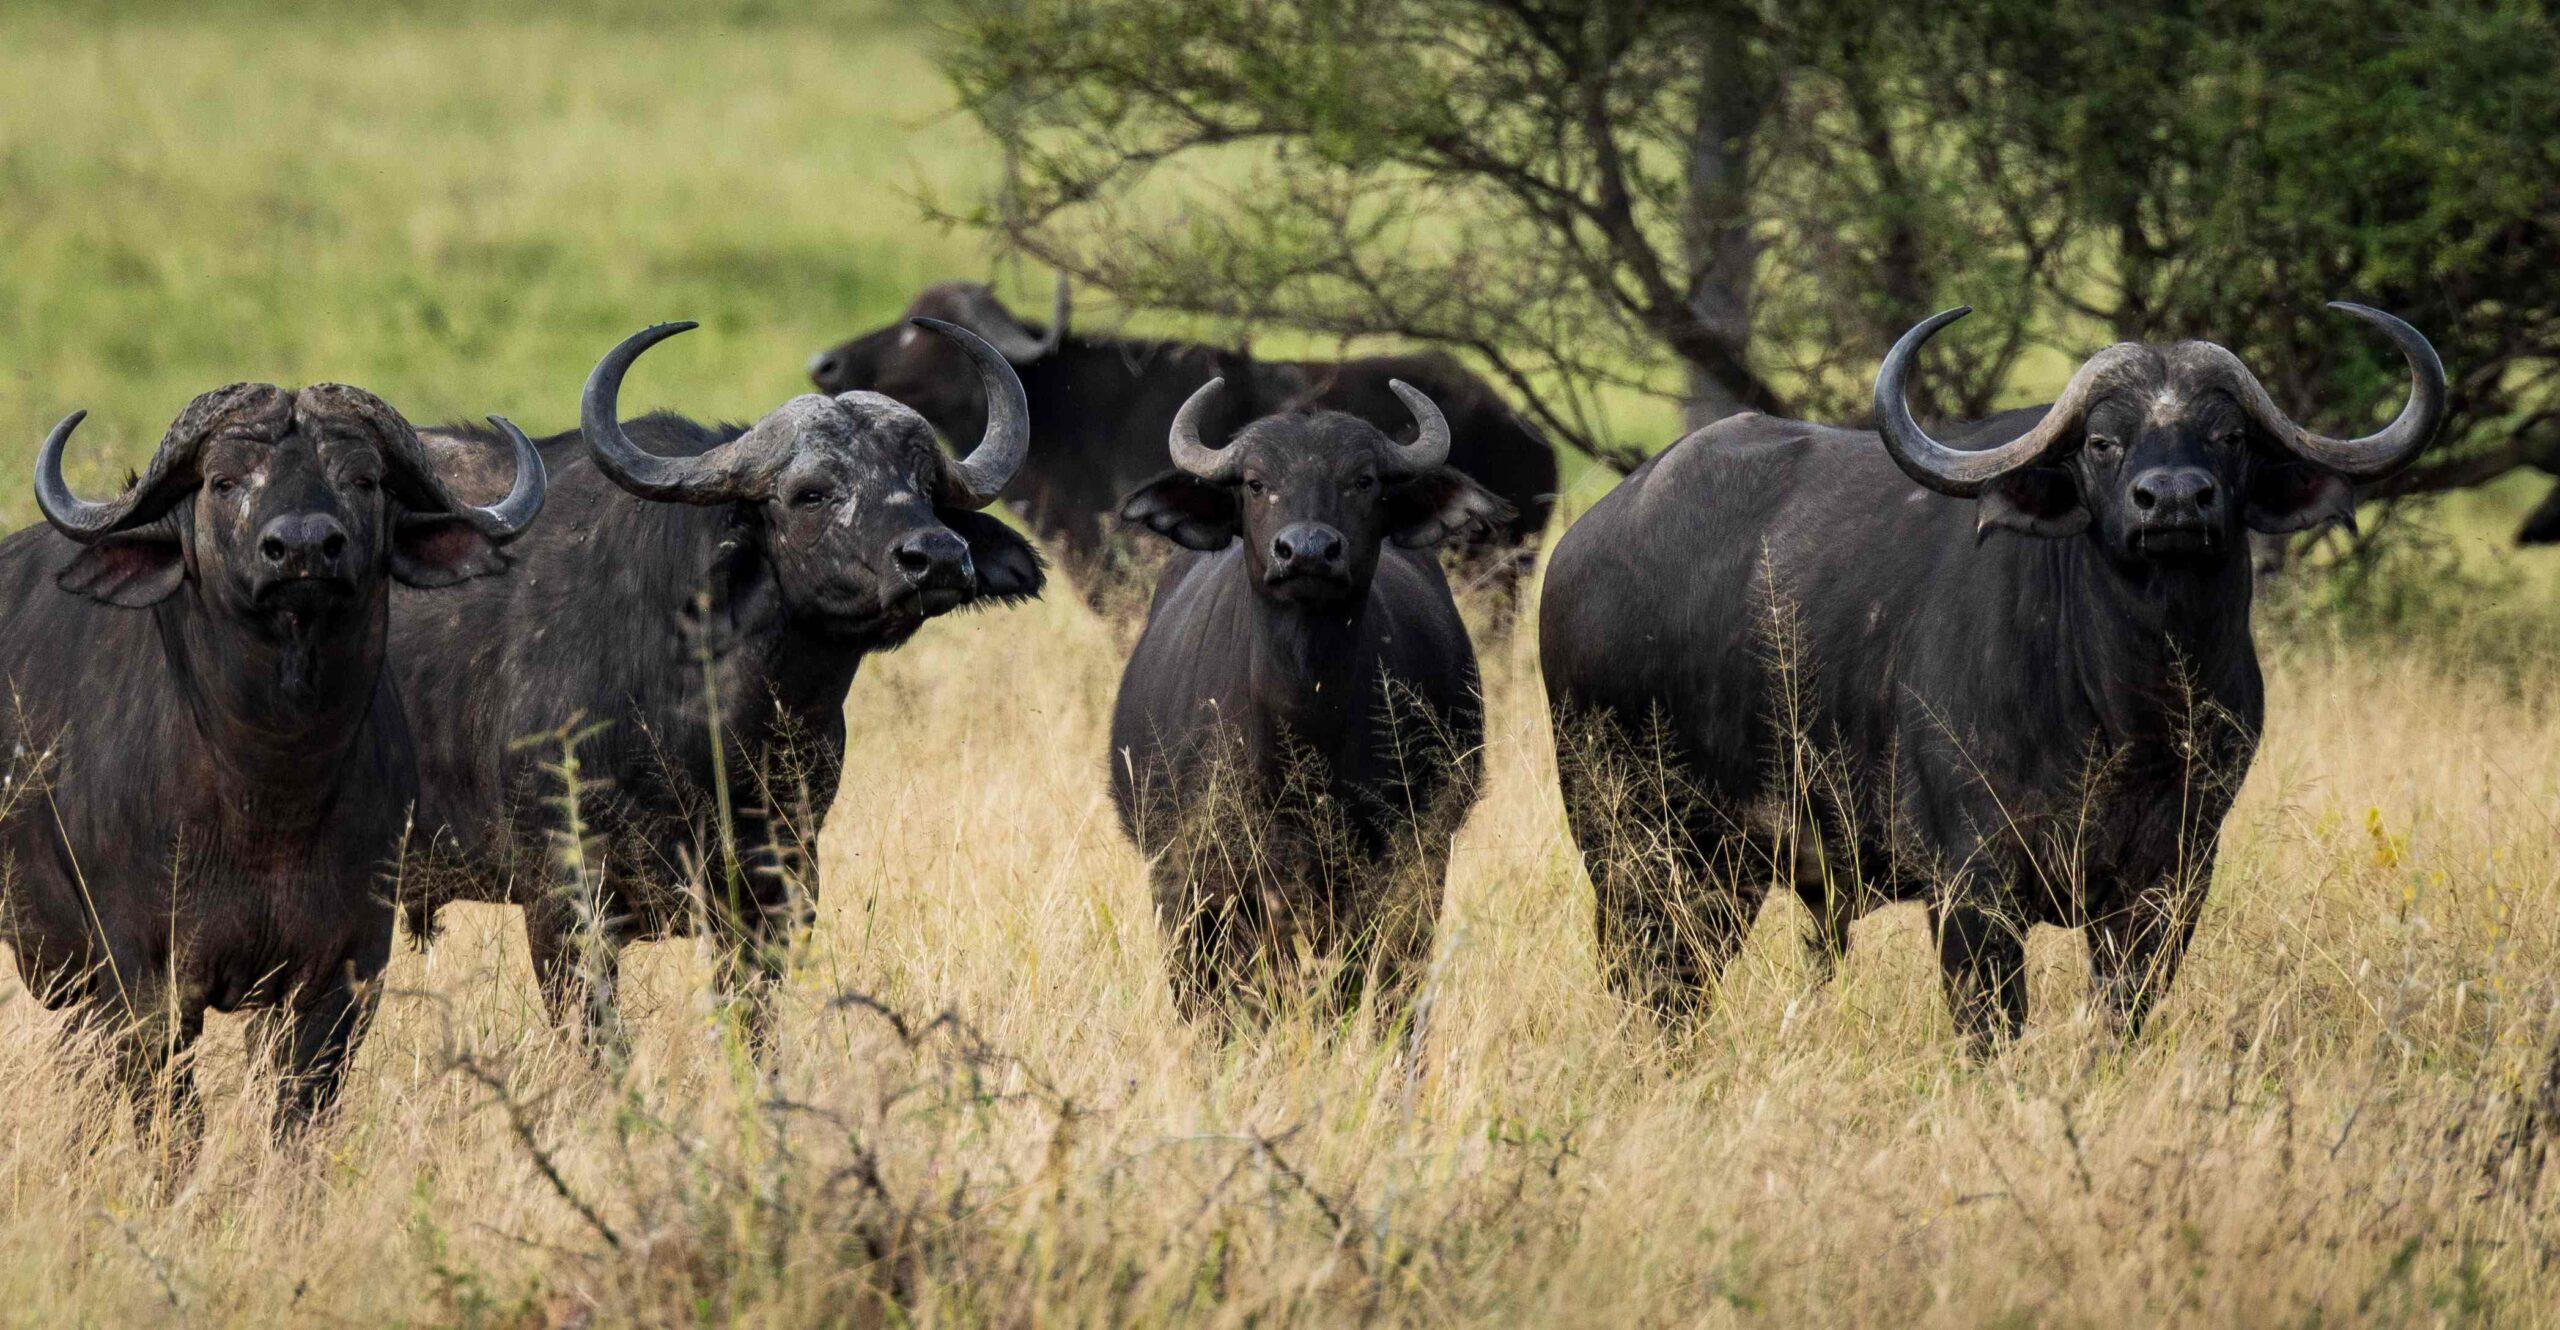 Herd of Buffalo in the Serengeti